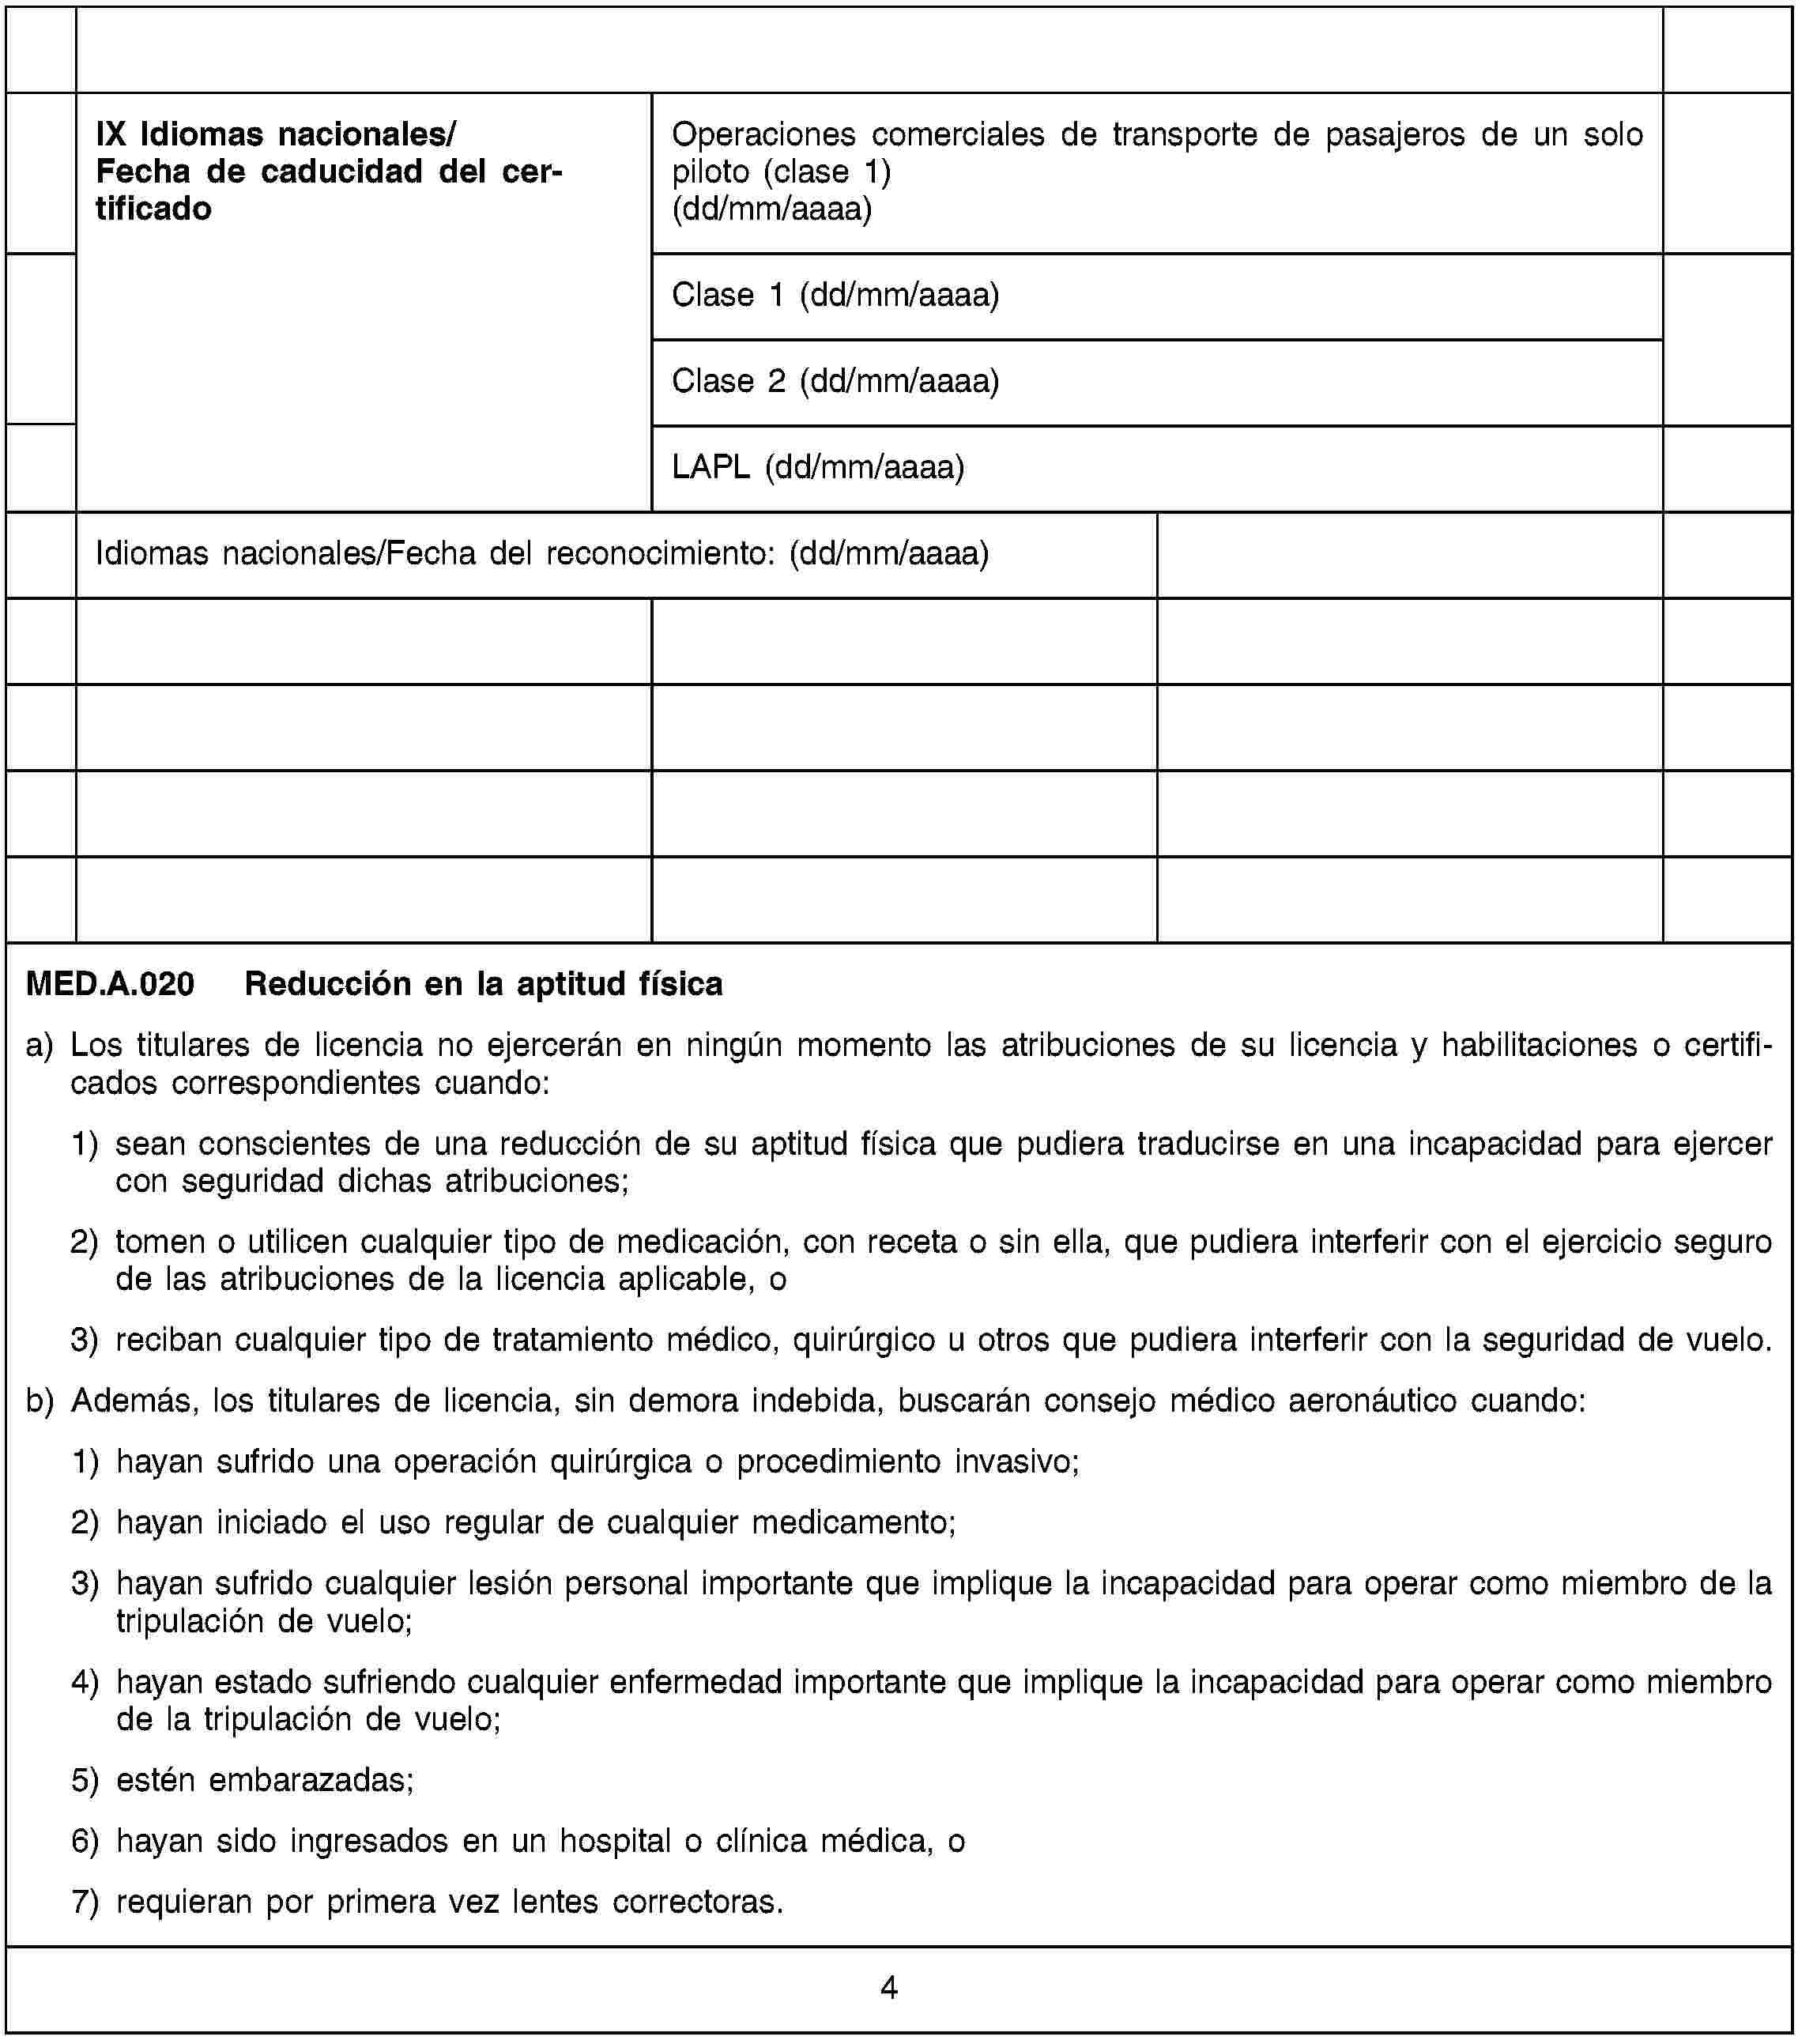 EUR-Lex - 02012R0290-20150408 - EN - EUR-Lex